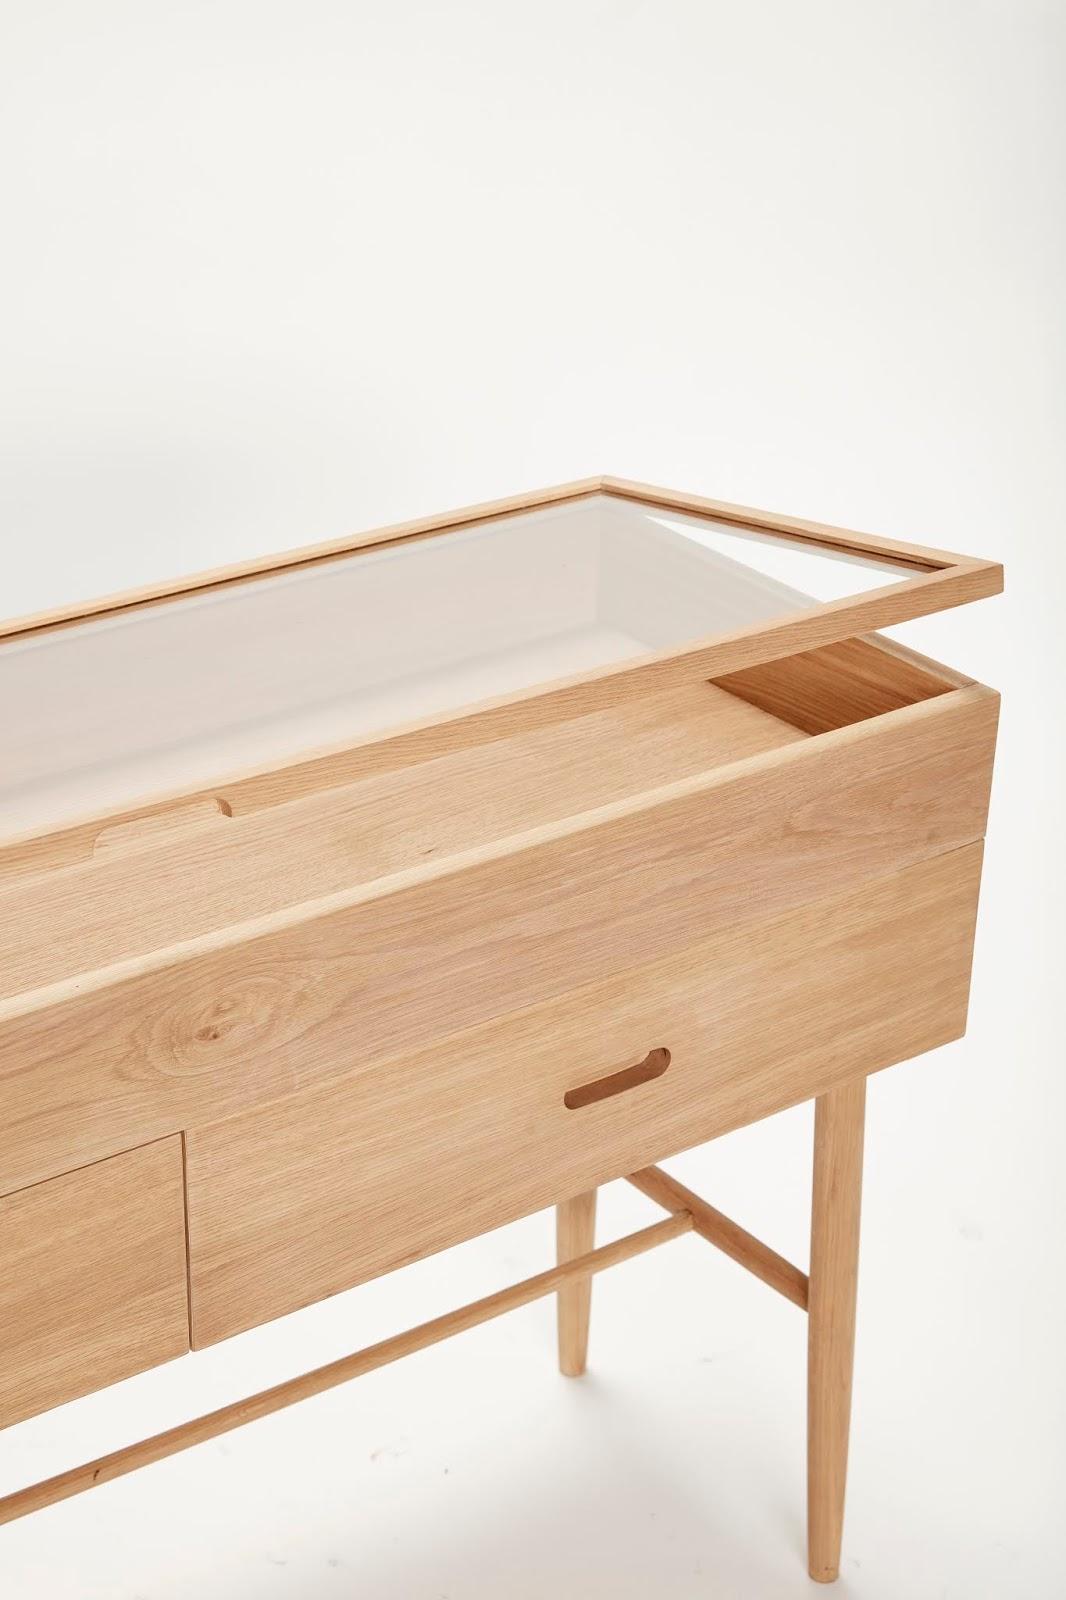 szafka z drewna ze szkłem